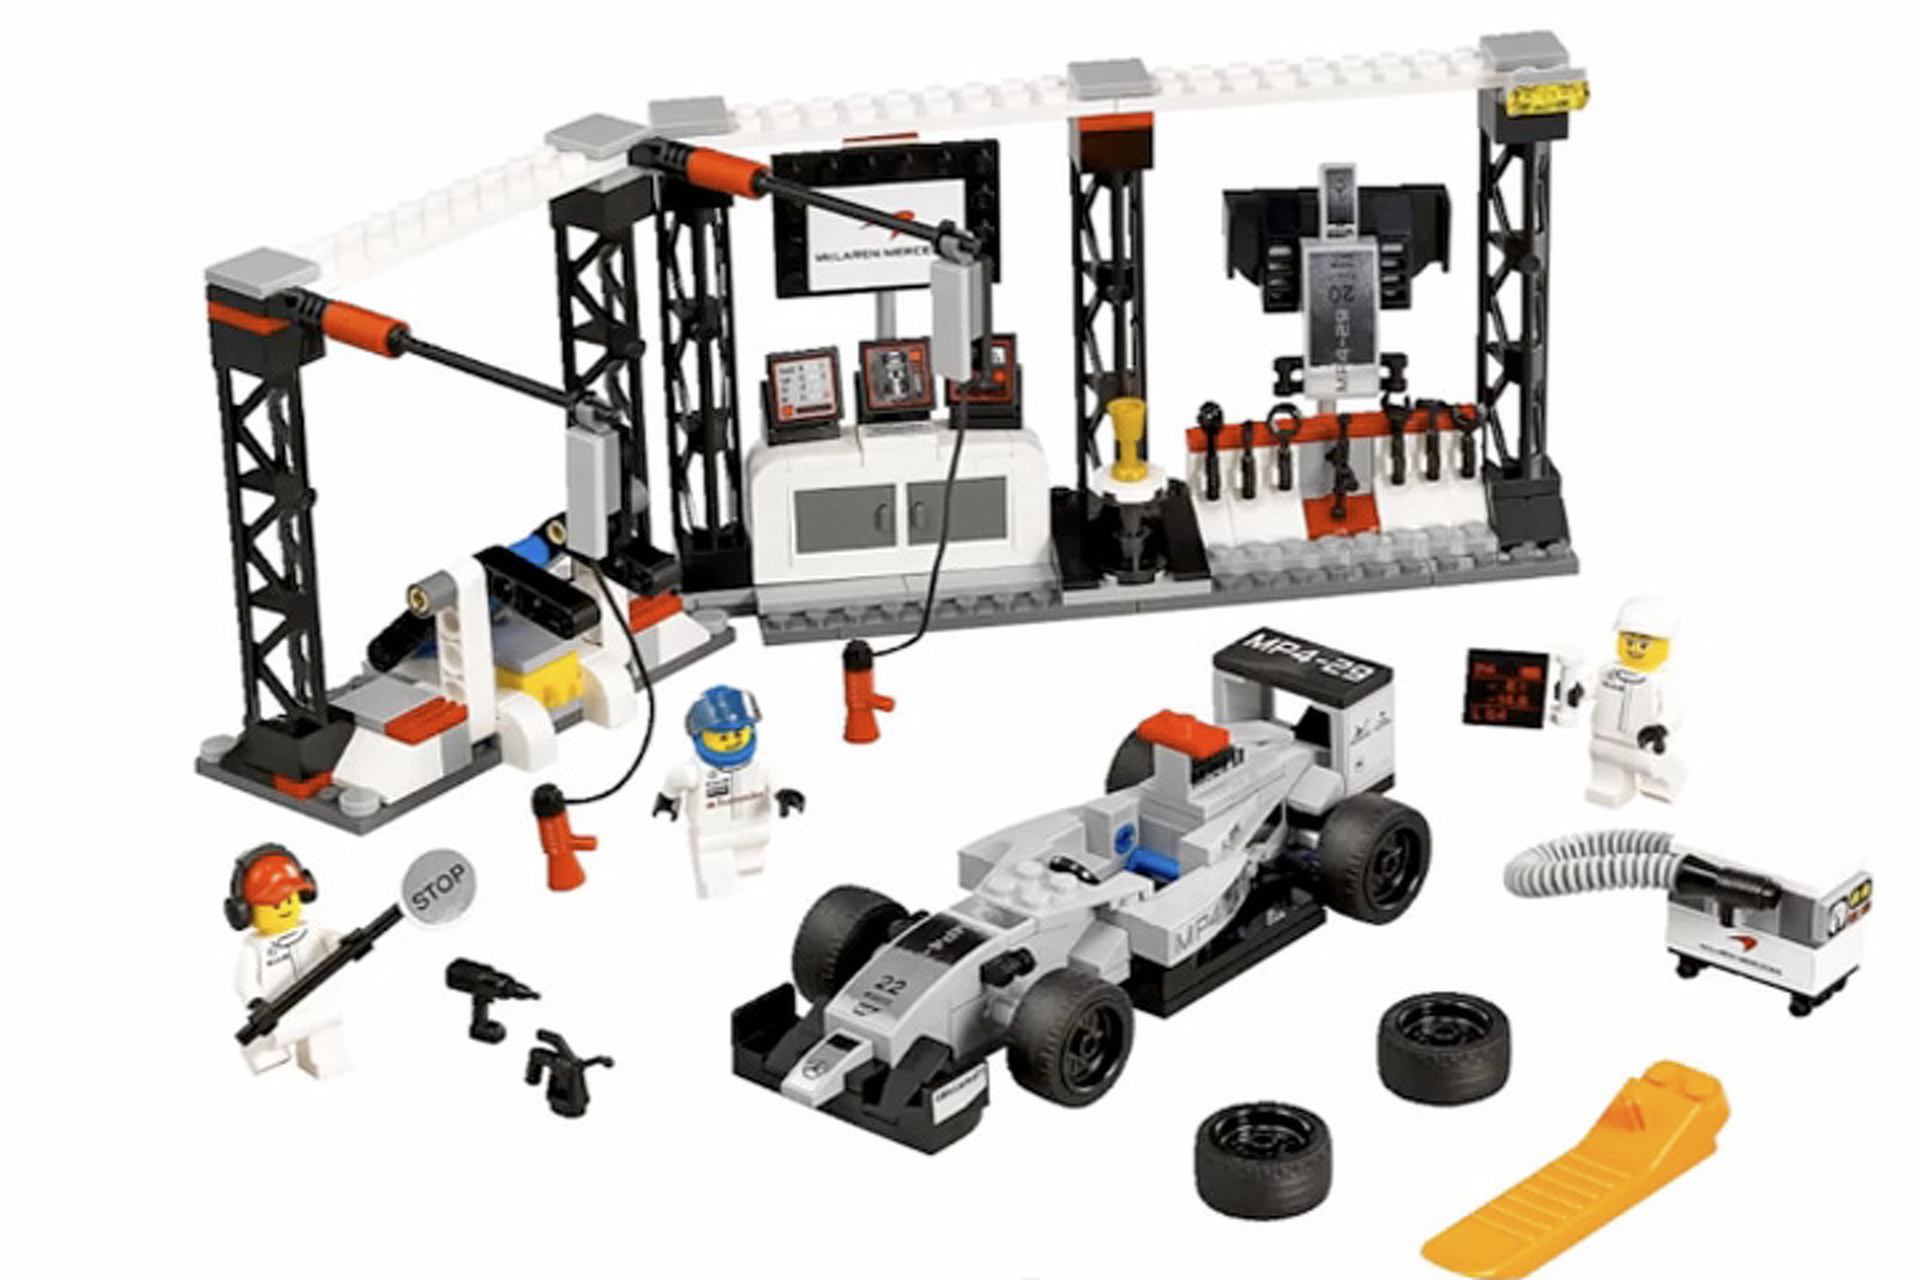 porsche-918-mclaren-p1-and-laferrari-become-lego-sets Mesmerizing Porsche 918 Spyder Lego Review Cars Trend